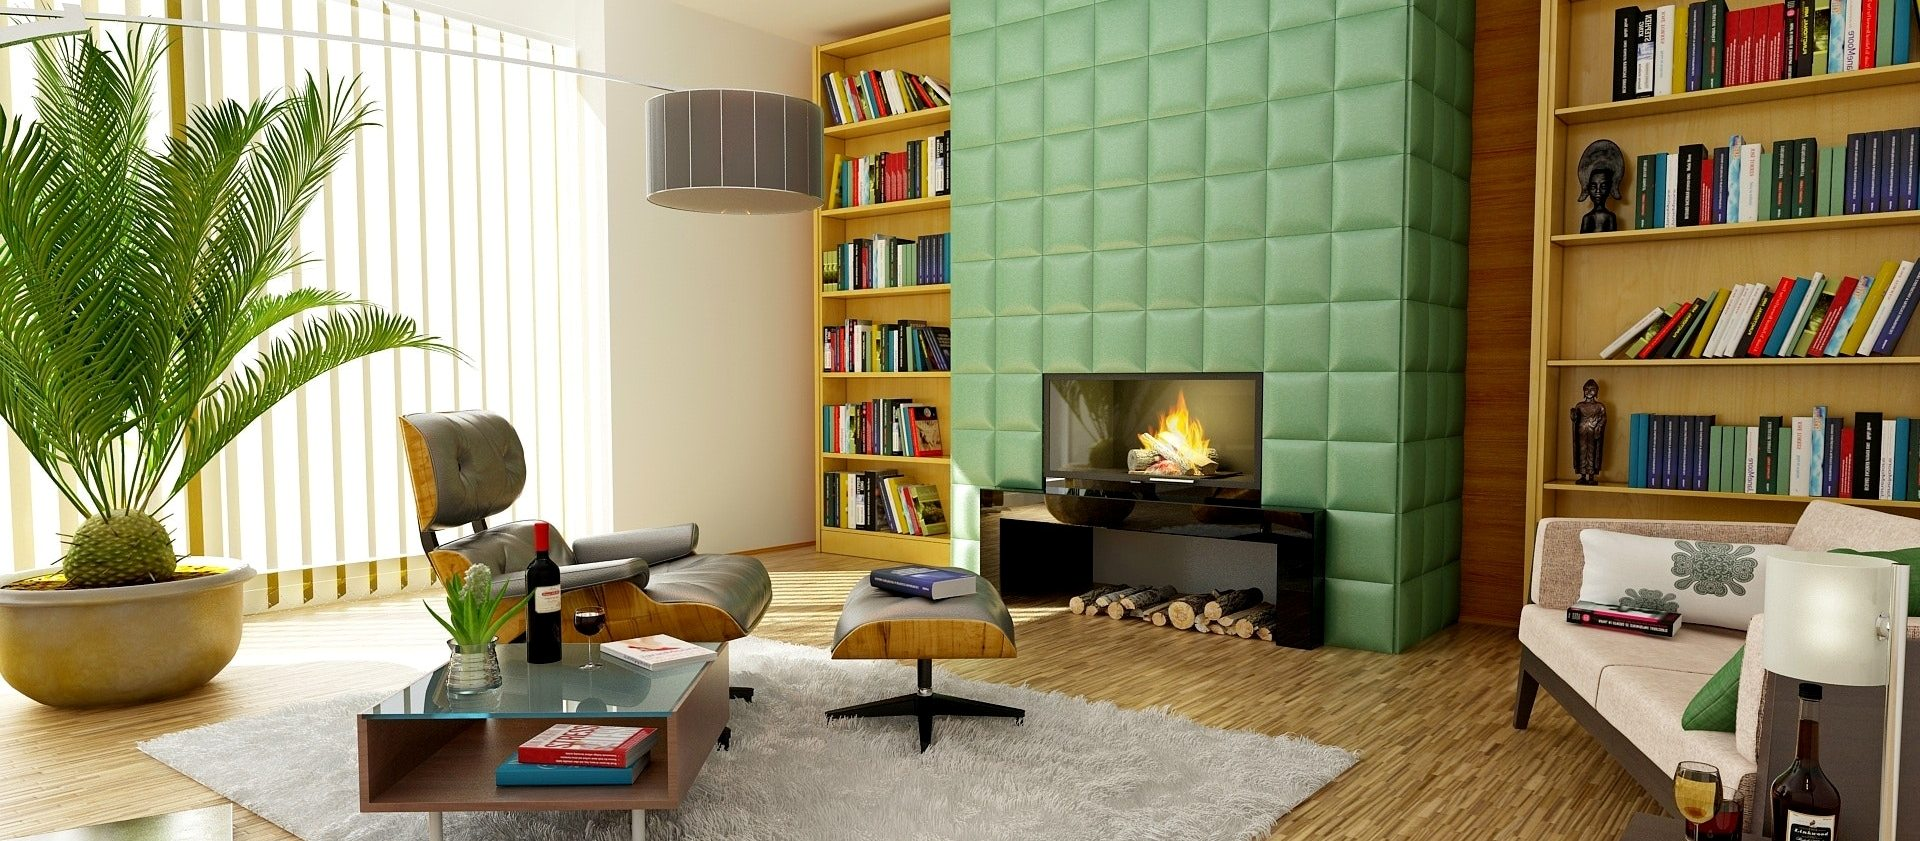 apartment-architecture-bookcase-bookshelves-271795